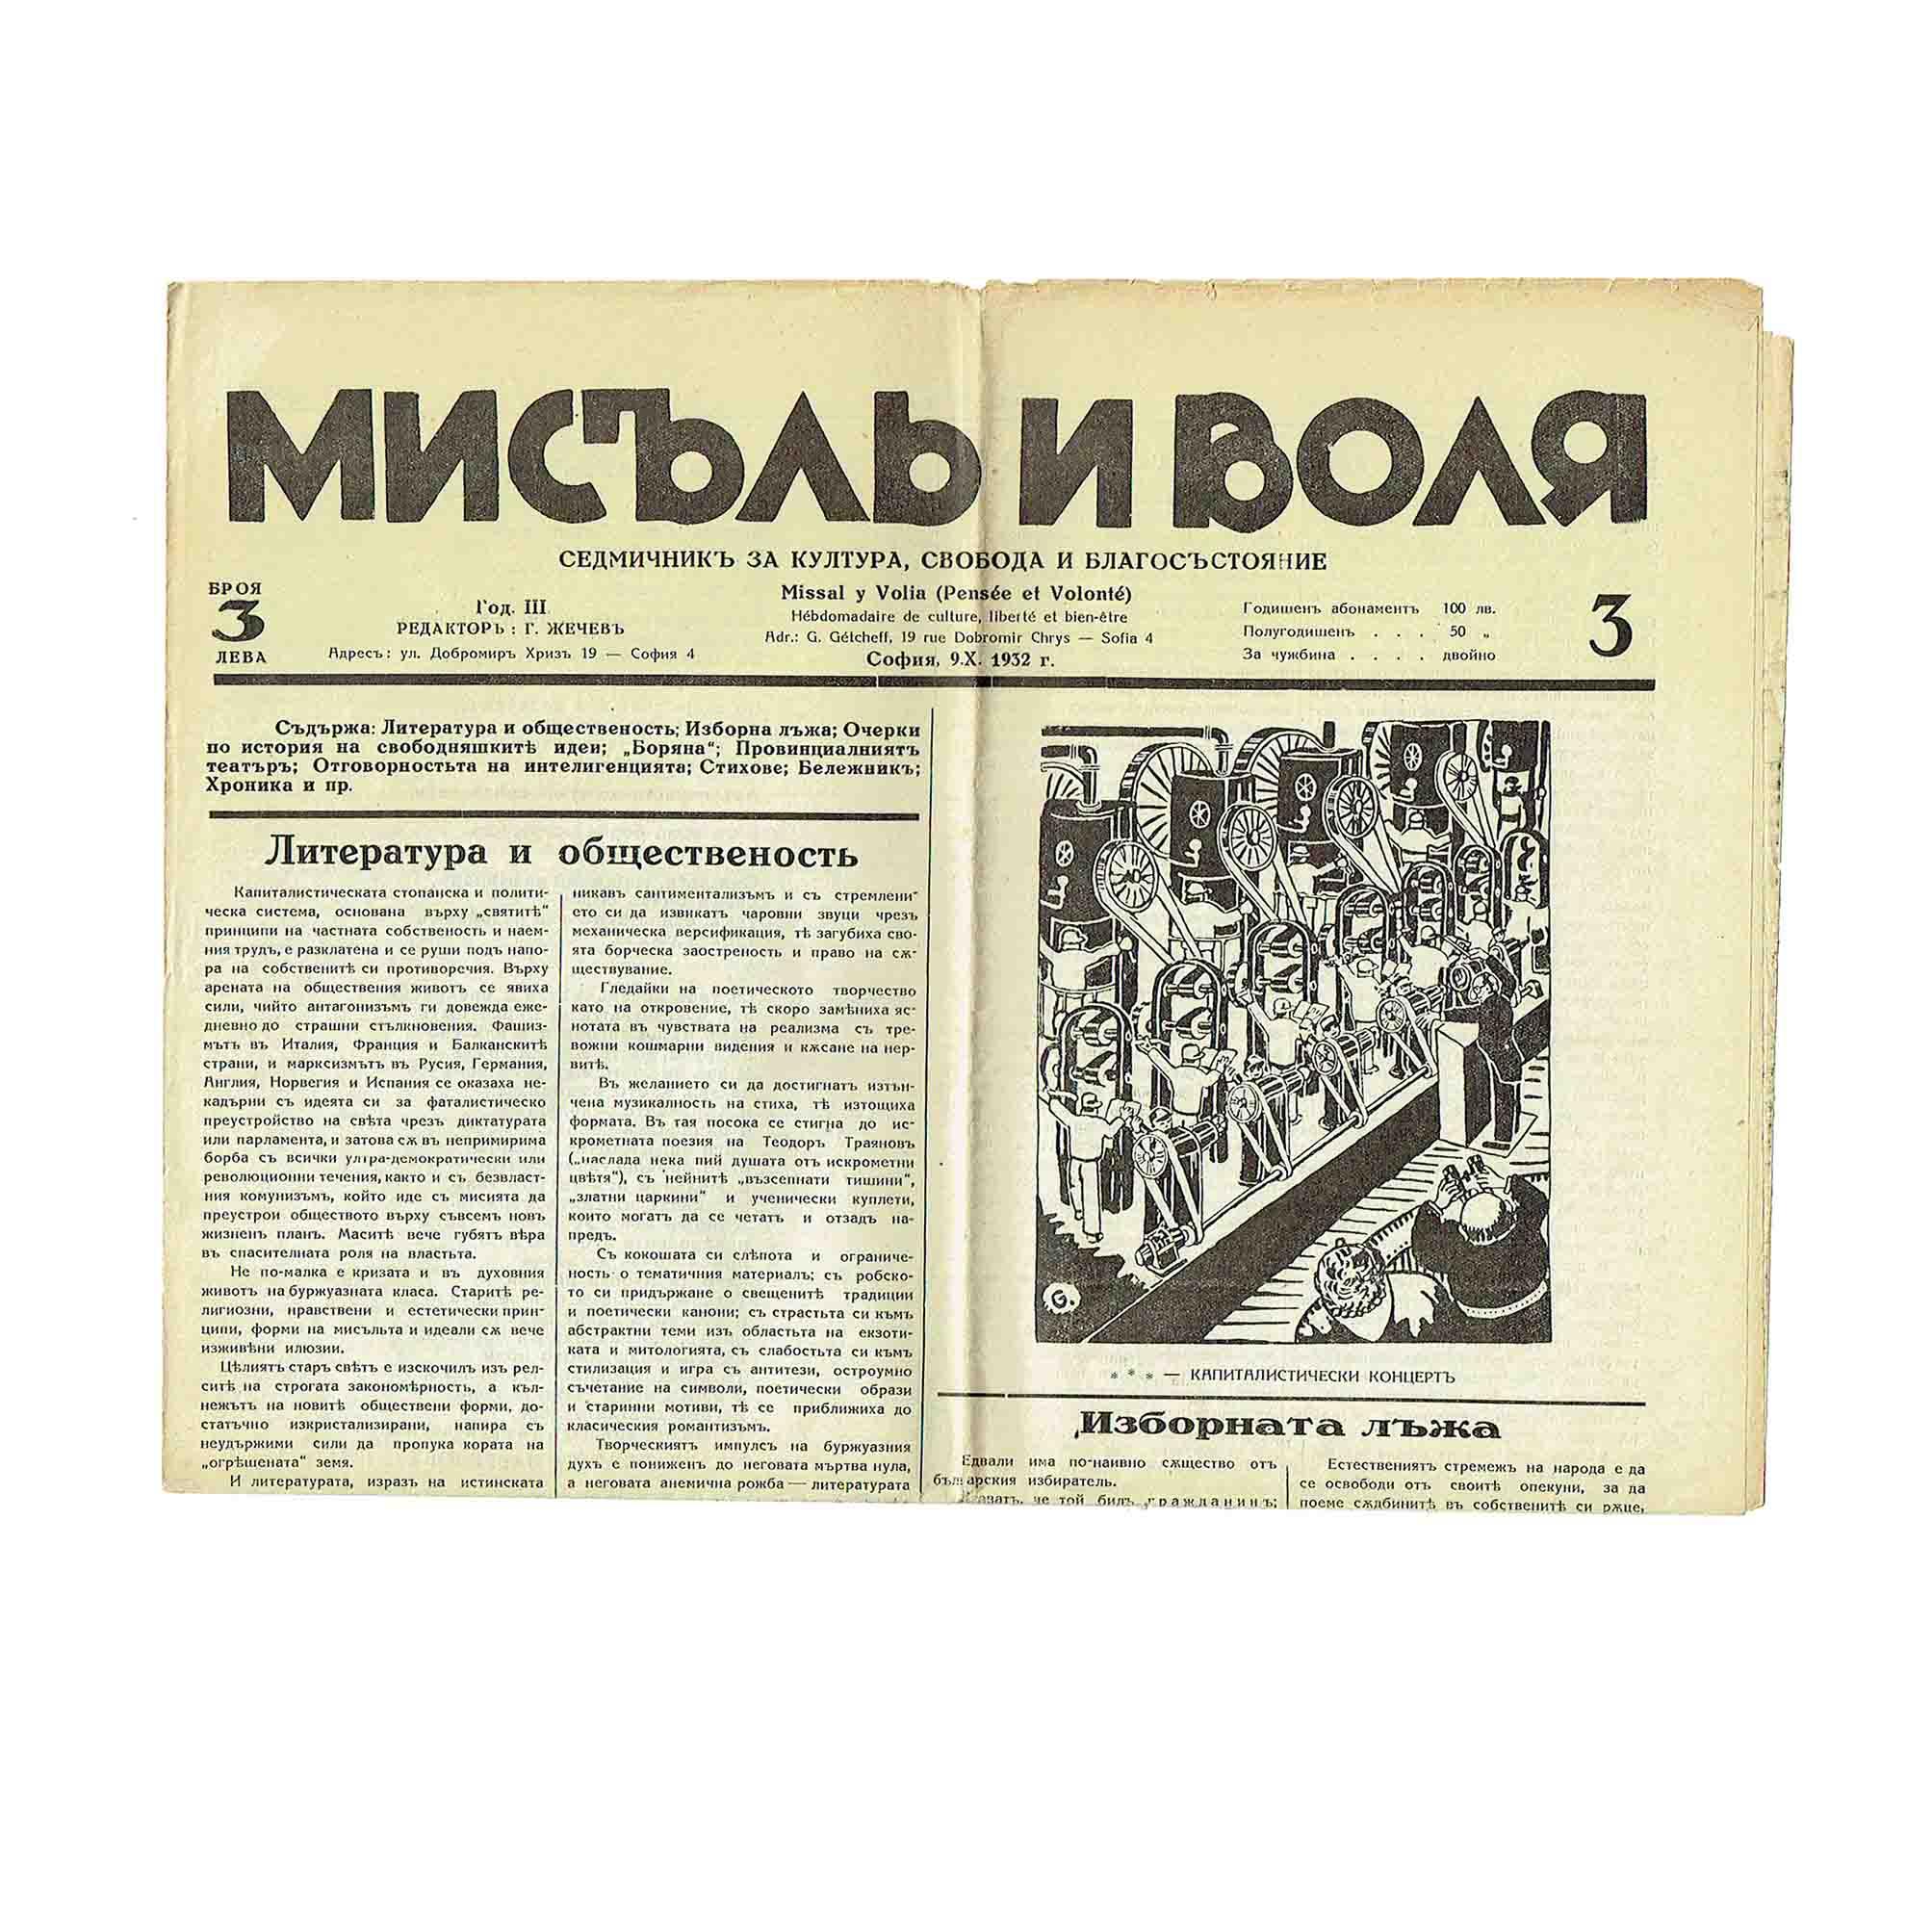 5864 Misal i Volya Gedanke und Wille III 3 1932 A N